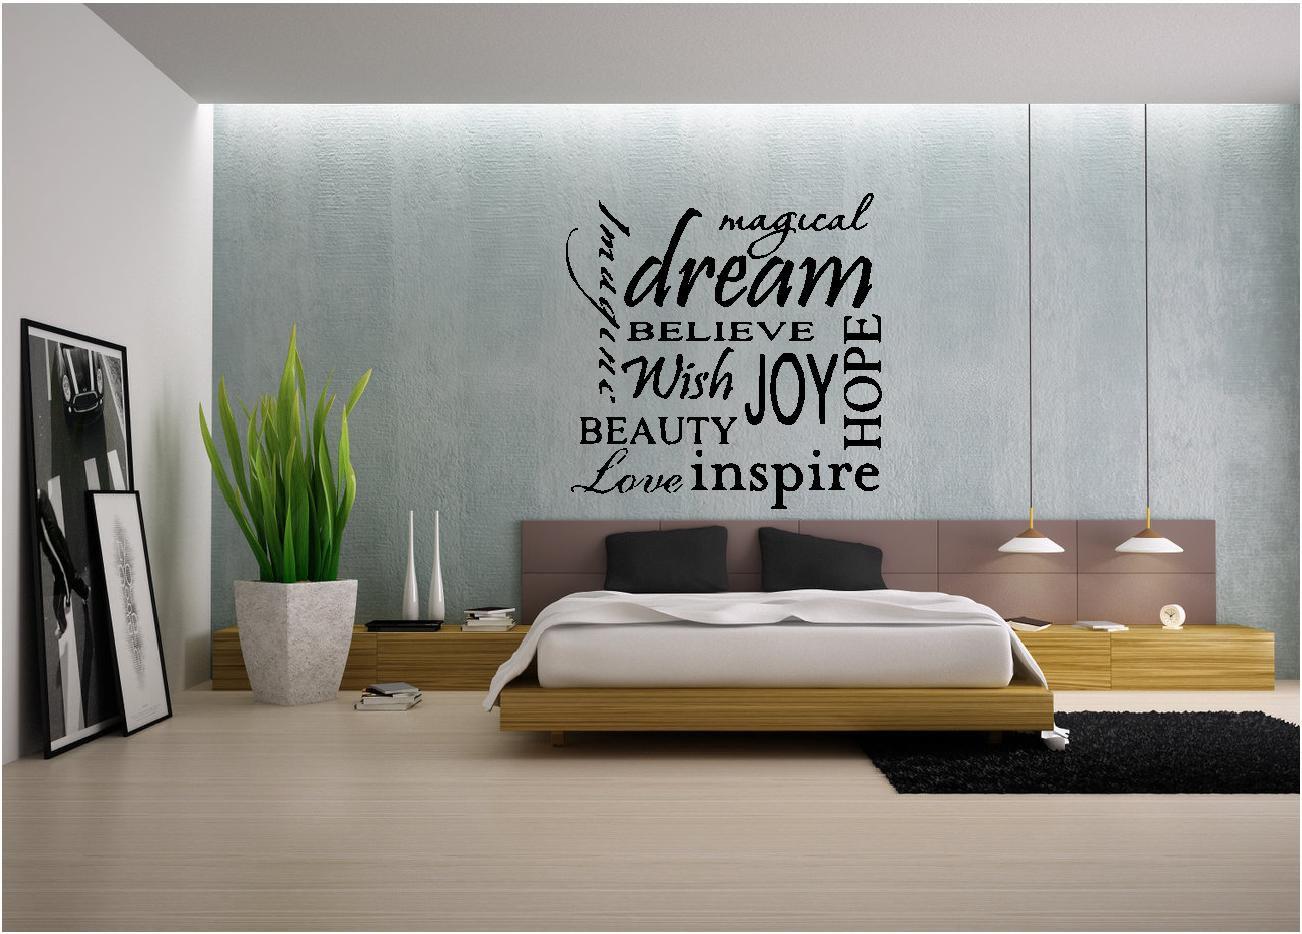 930+ Gambar Tulisan Keren Dinding Kamar Terbaru